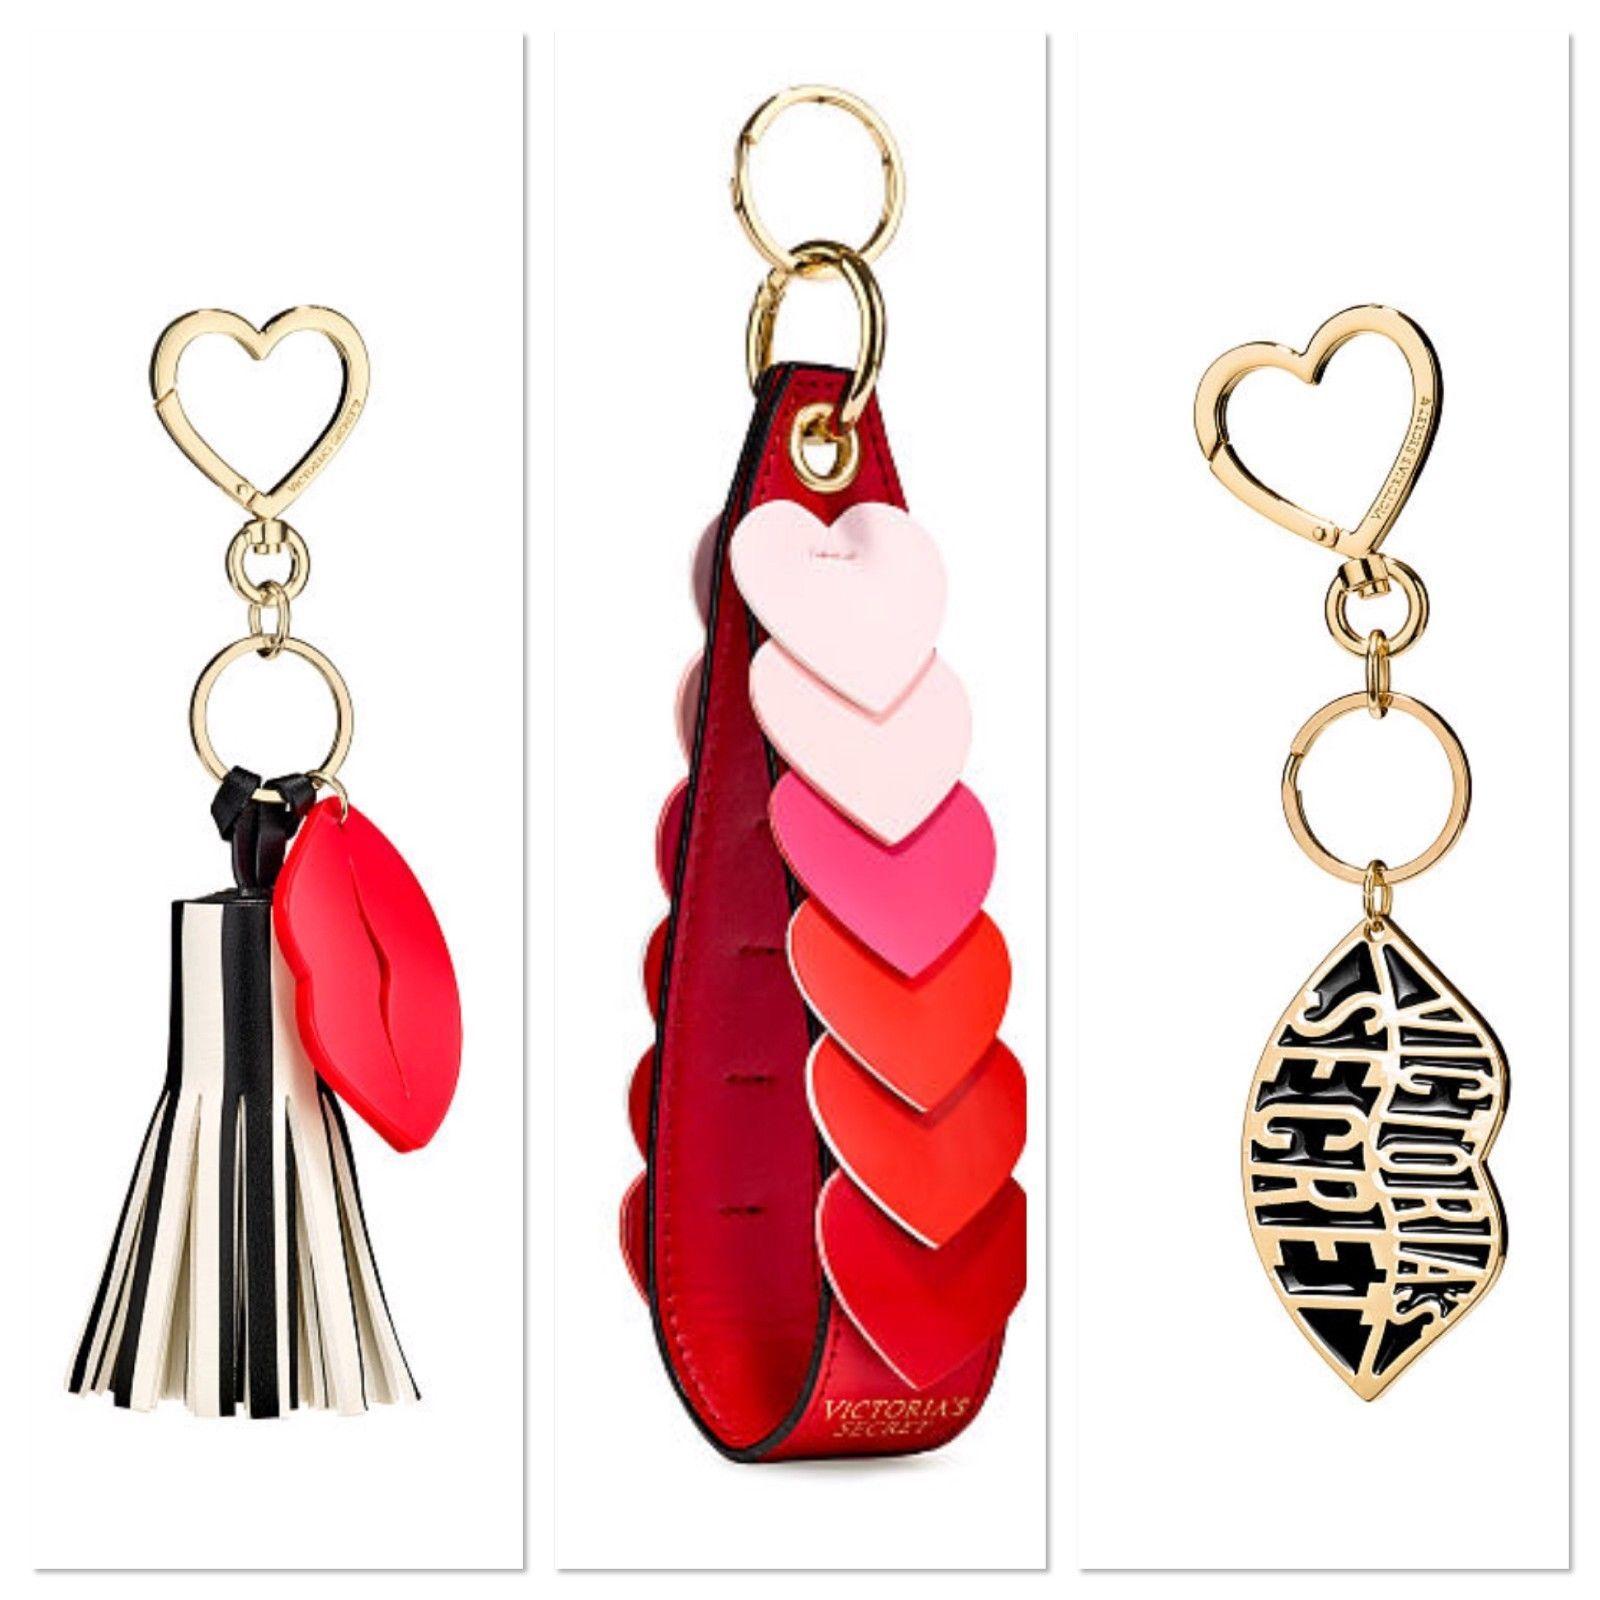 Victoria/'s Secret Charm Wristlet Strap Hearts Lip Tassel Your Pick